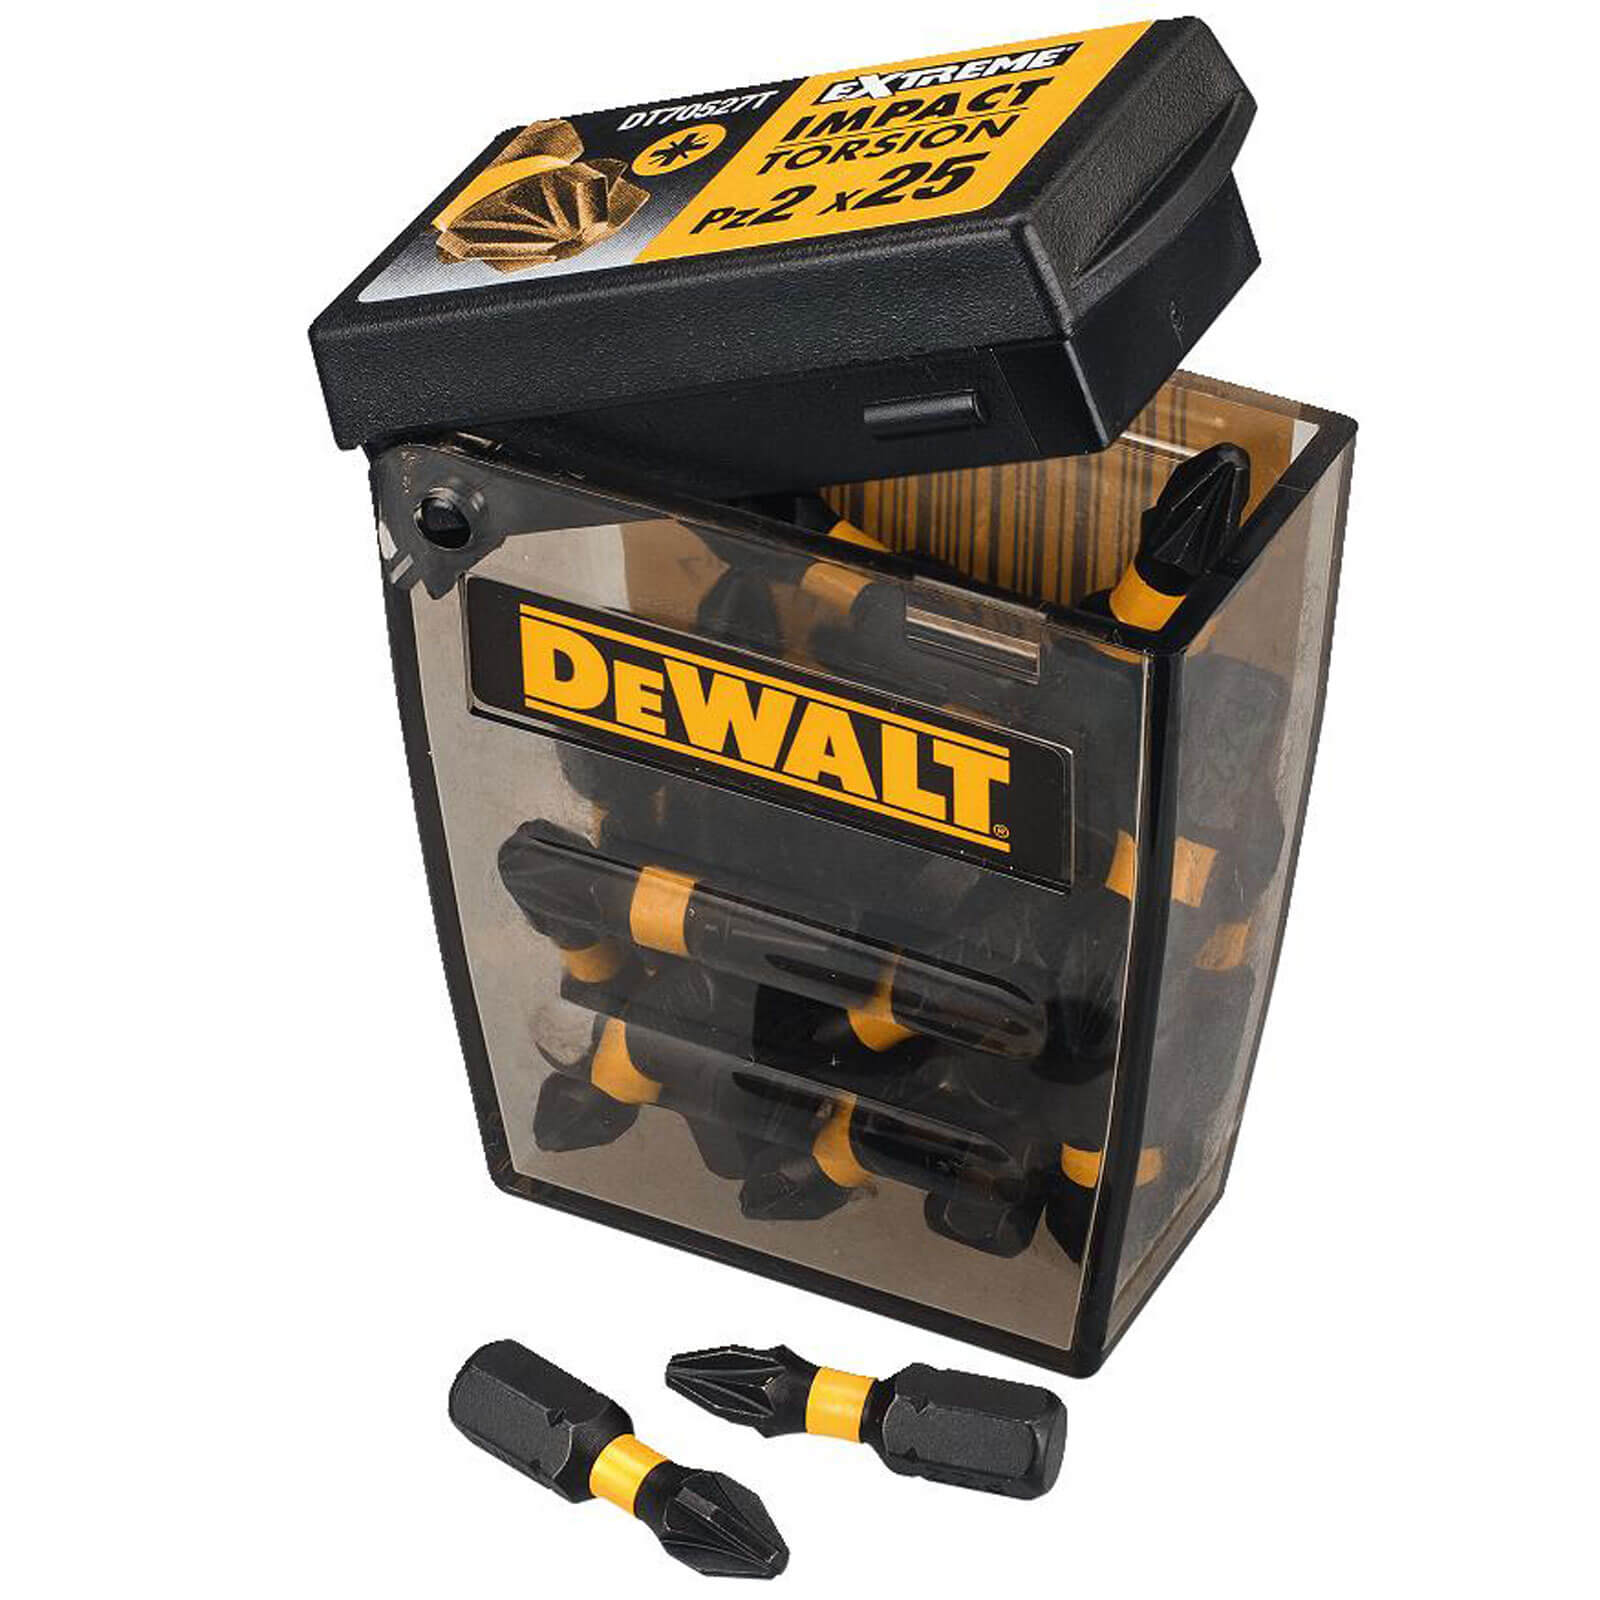 Image of DeWalt Extreme Impact Pozi Screwdriver Bits PZ2 25mm Pack of 25